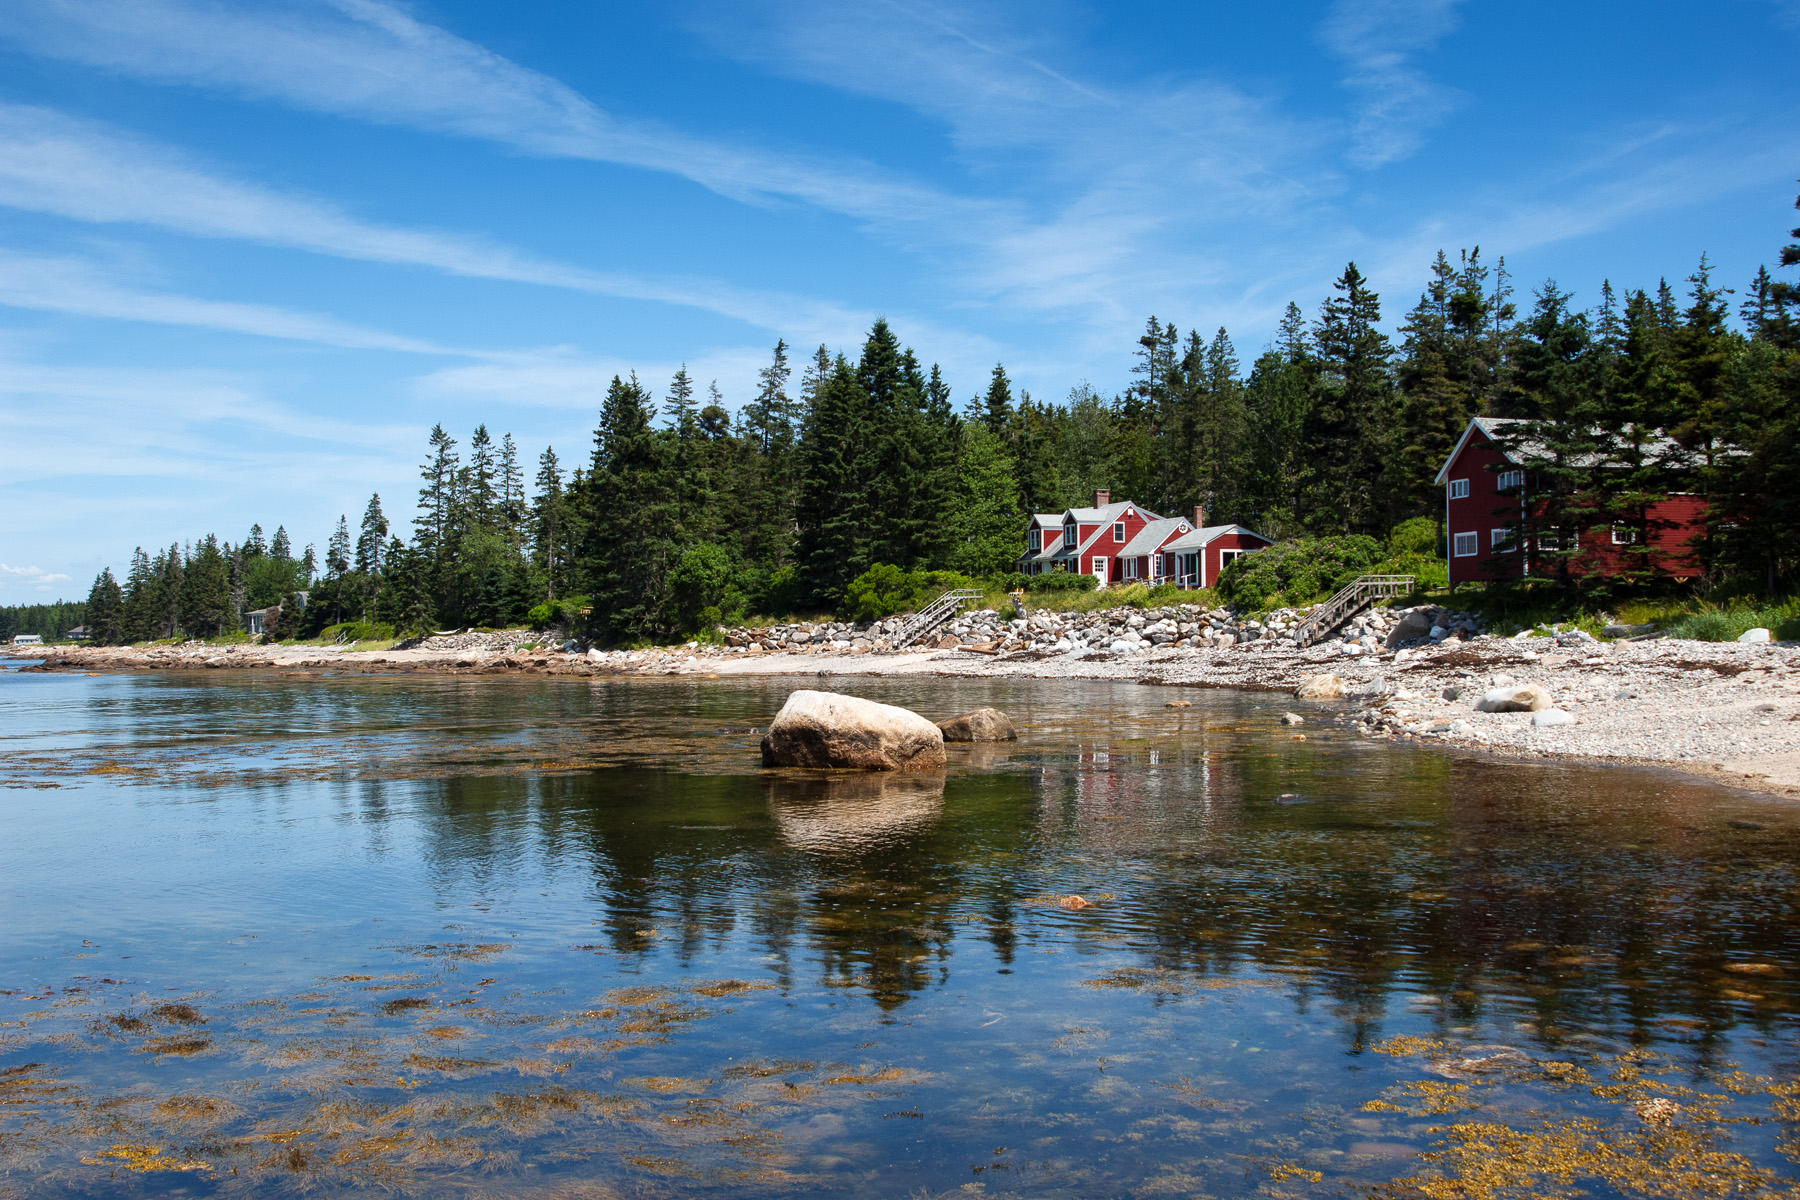 Single Family Home for Sale at 75 Jones Farm Road Bristol, Maine 04554 United States